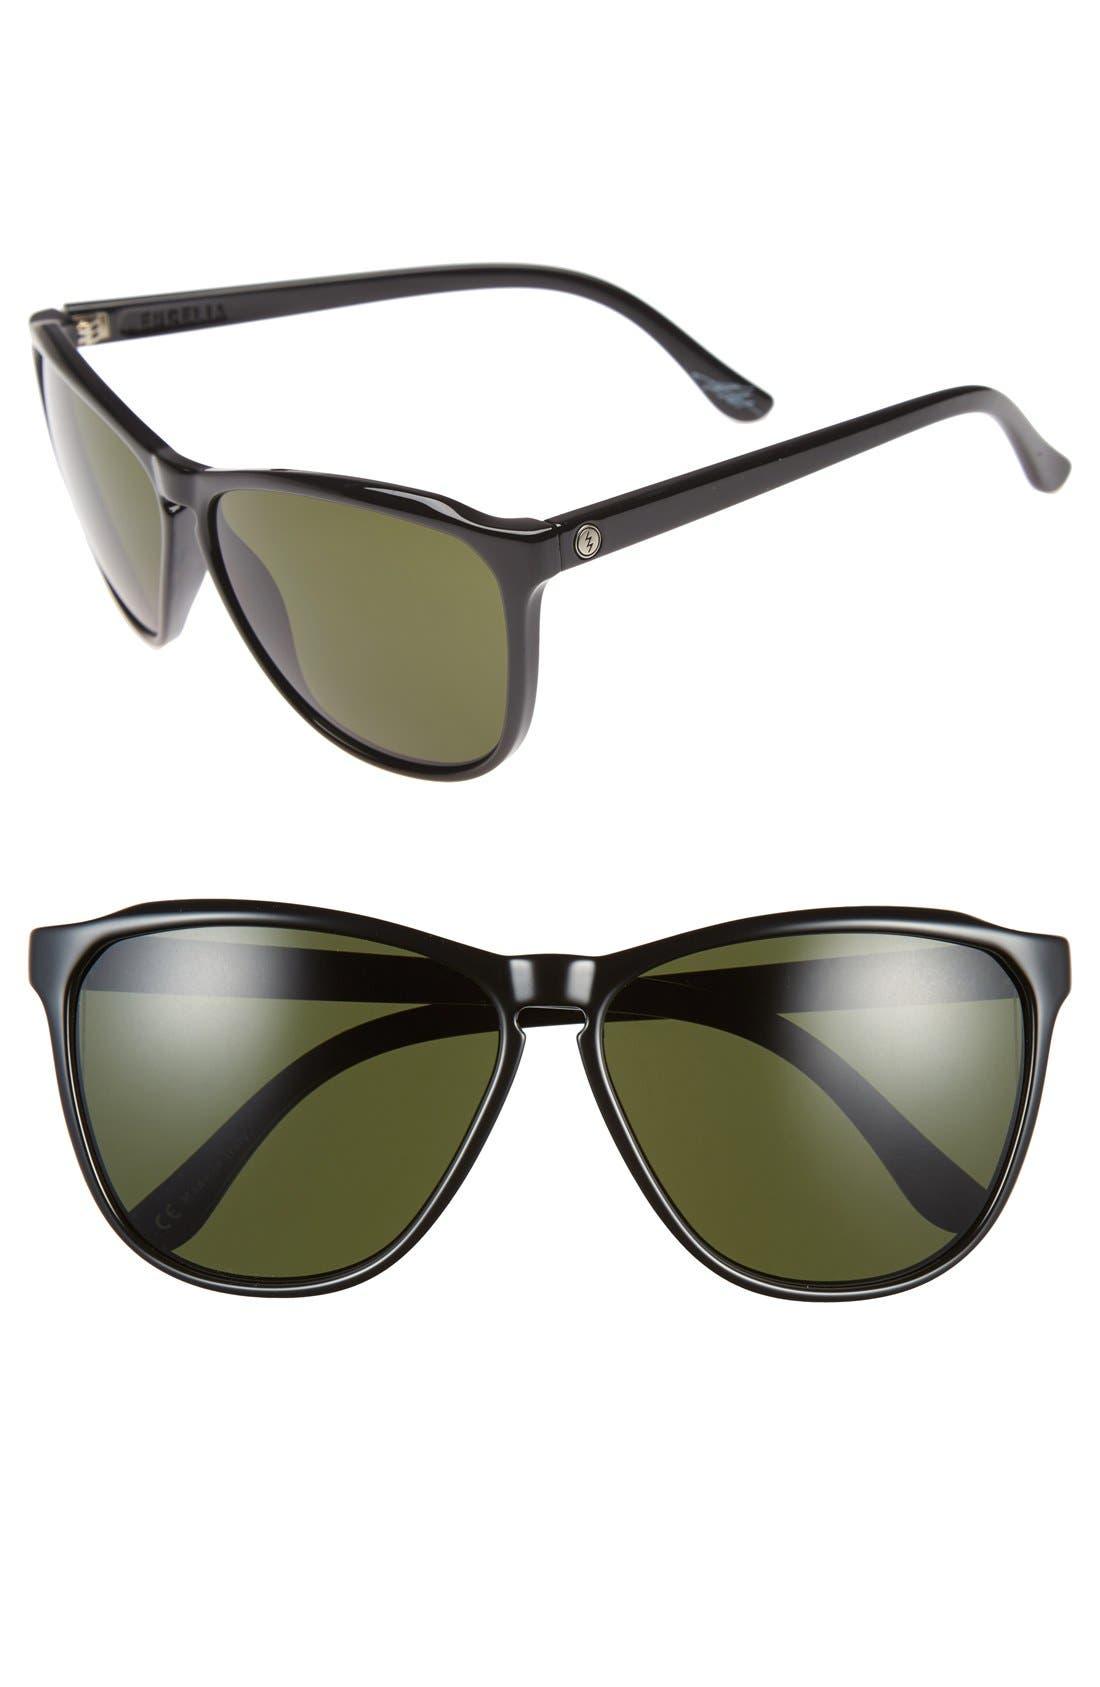 'Encelia' 61mm Retro Sunglasses,                             Main thumbnail 1, color,                             Gloss Black/ Grey